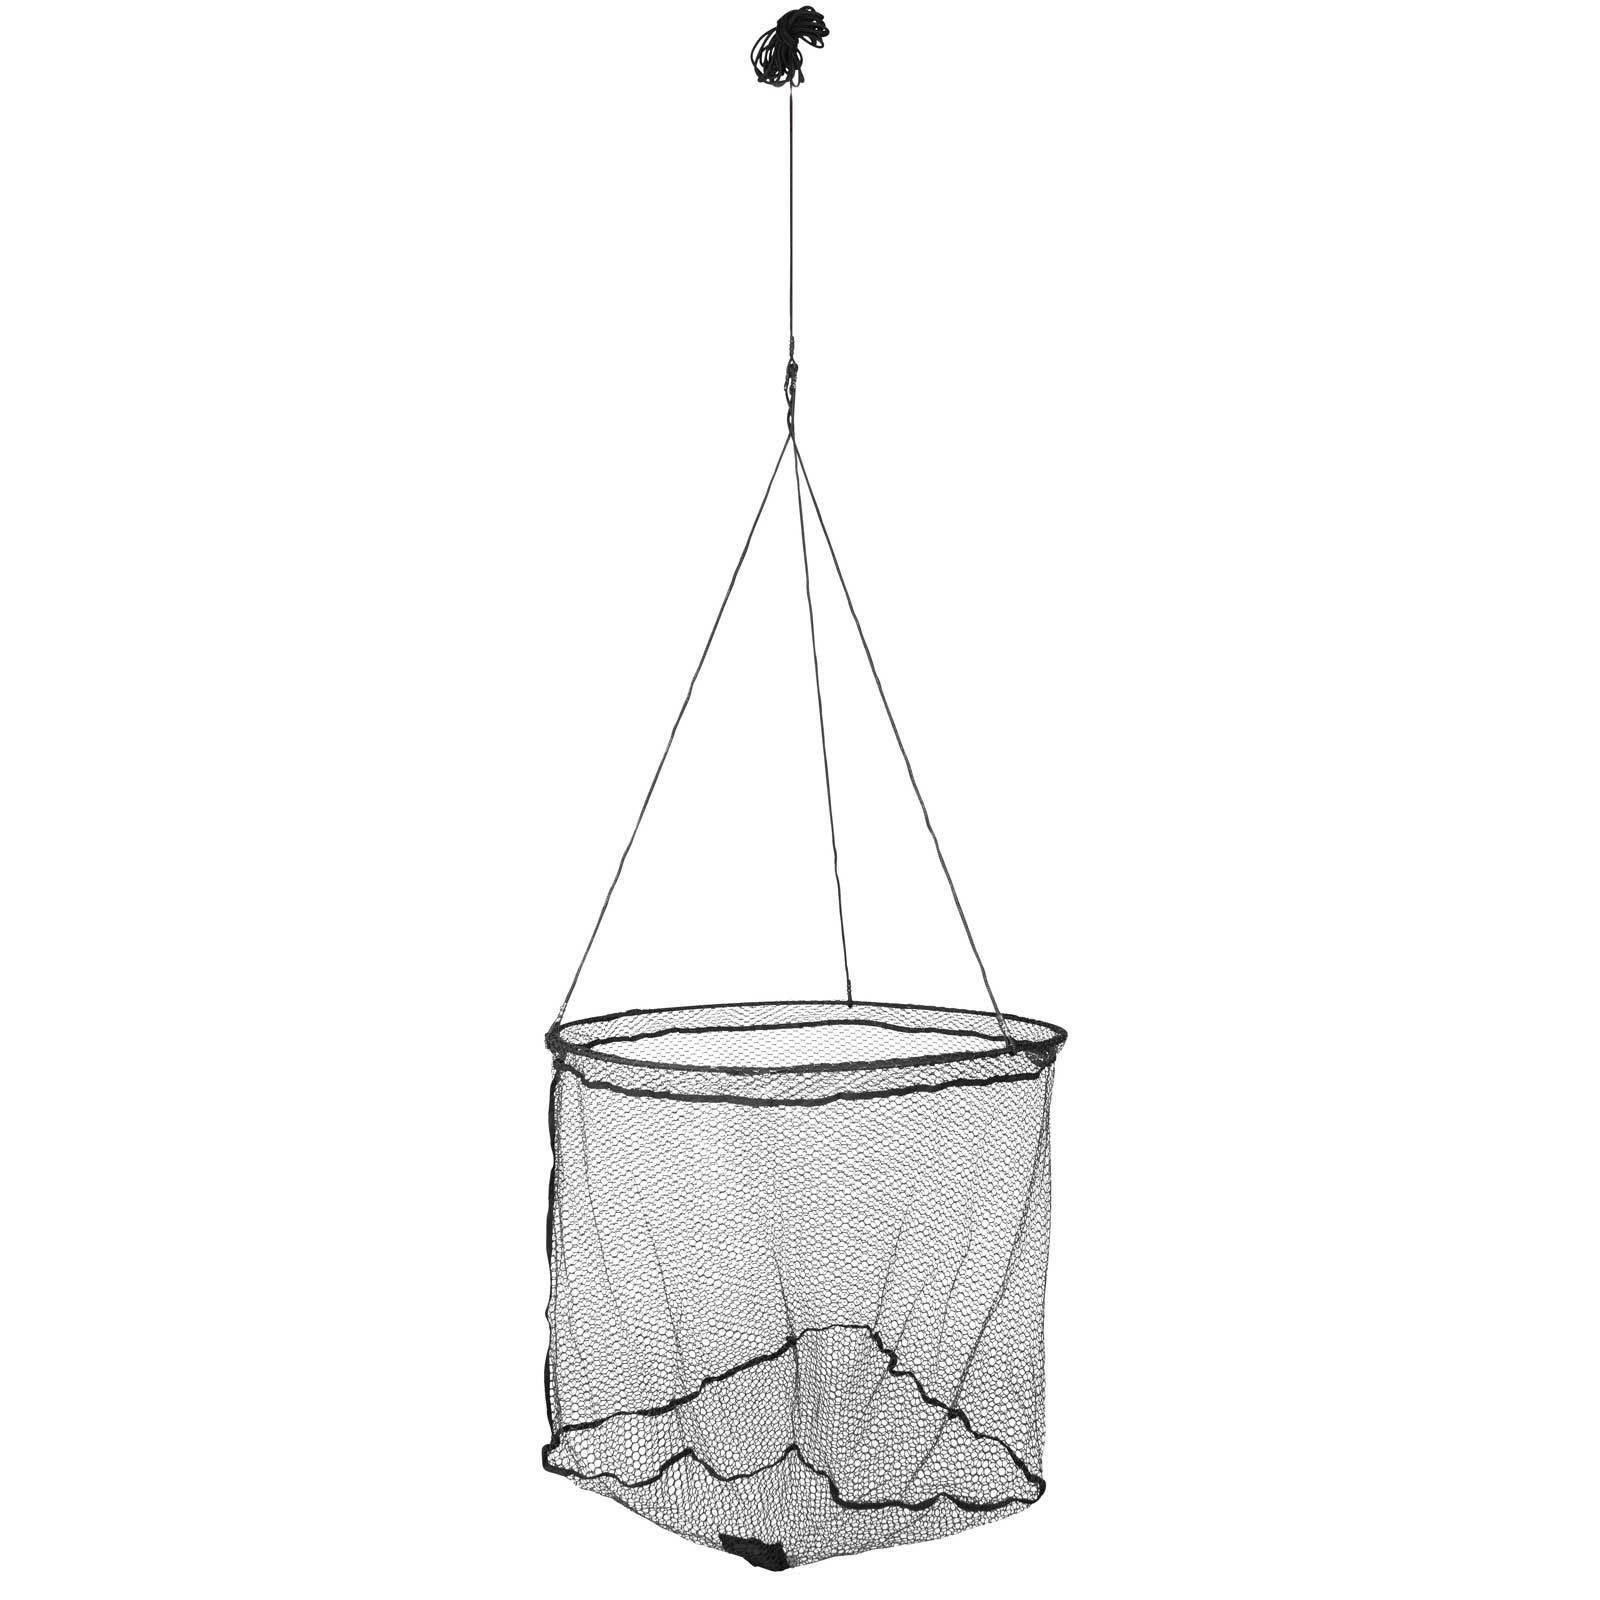 SPRO spundwandkescher pêche épuisette-Freestyle Drop Net Xtra 60 cm